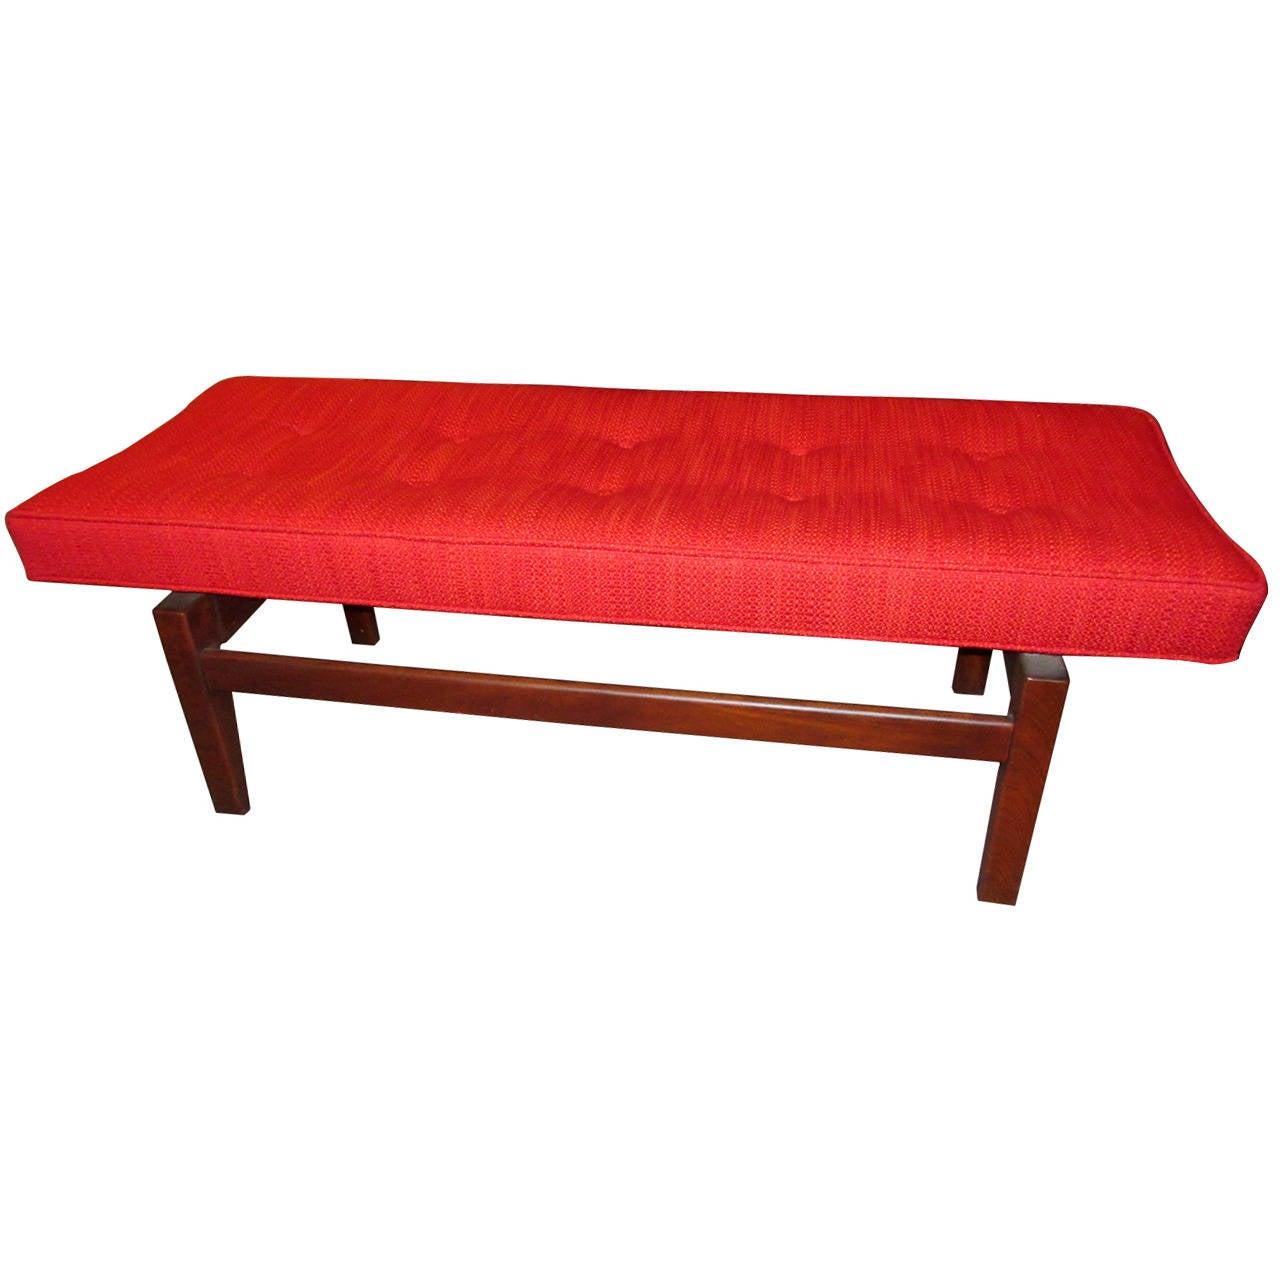 Jens risom floating bench for sale at 1stdibs - Jens Risom Floating Bench 1